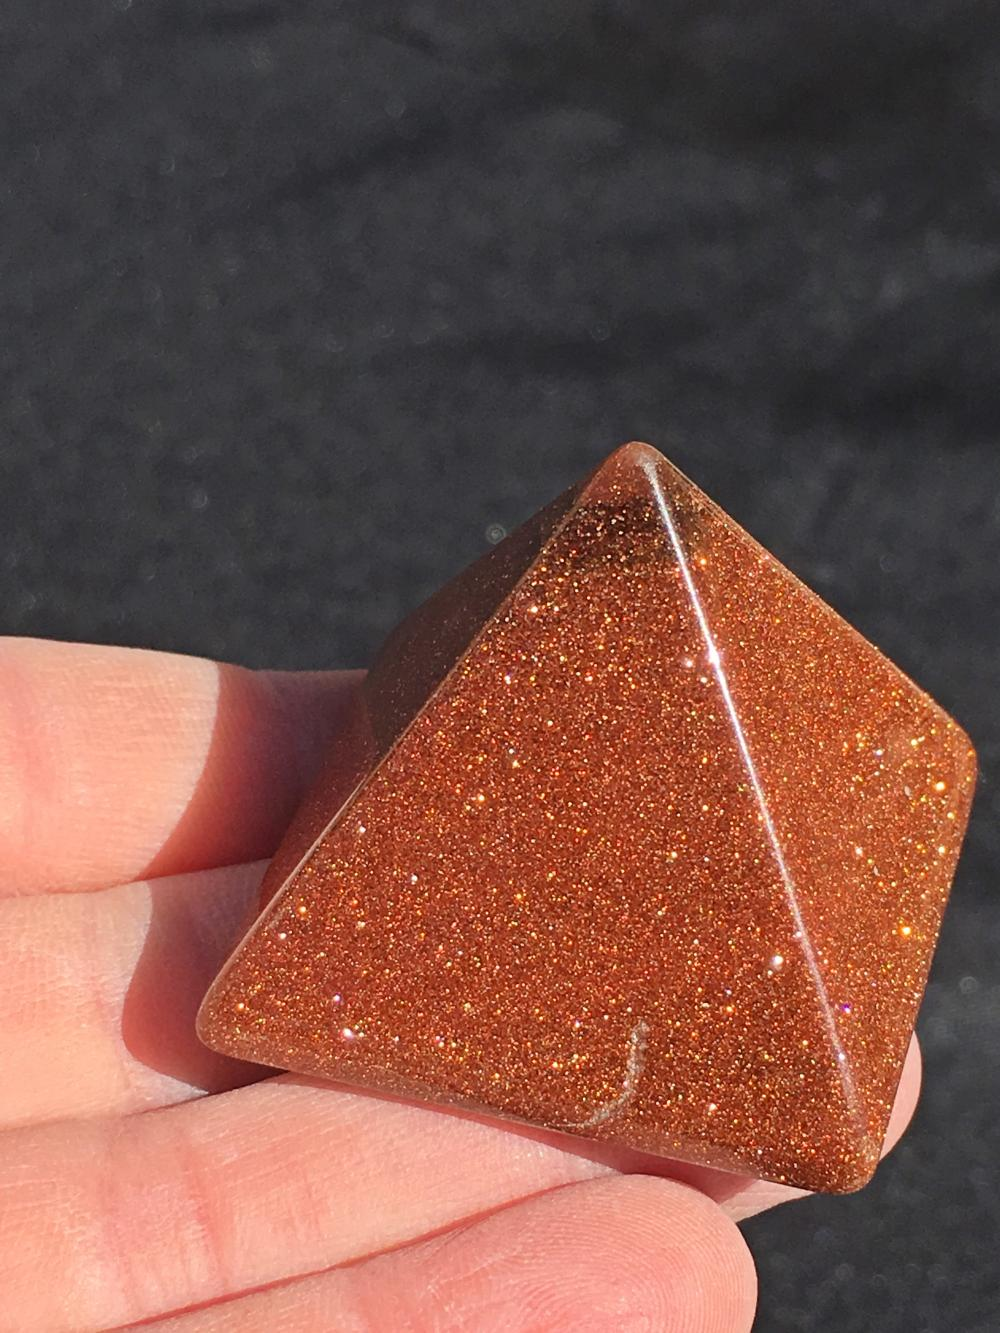 Goldstone Glass : goldstone, glass, Goldstone,, Glass,, Crystal,, Collectible,, Carving,, Pyramid